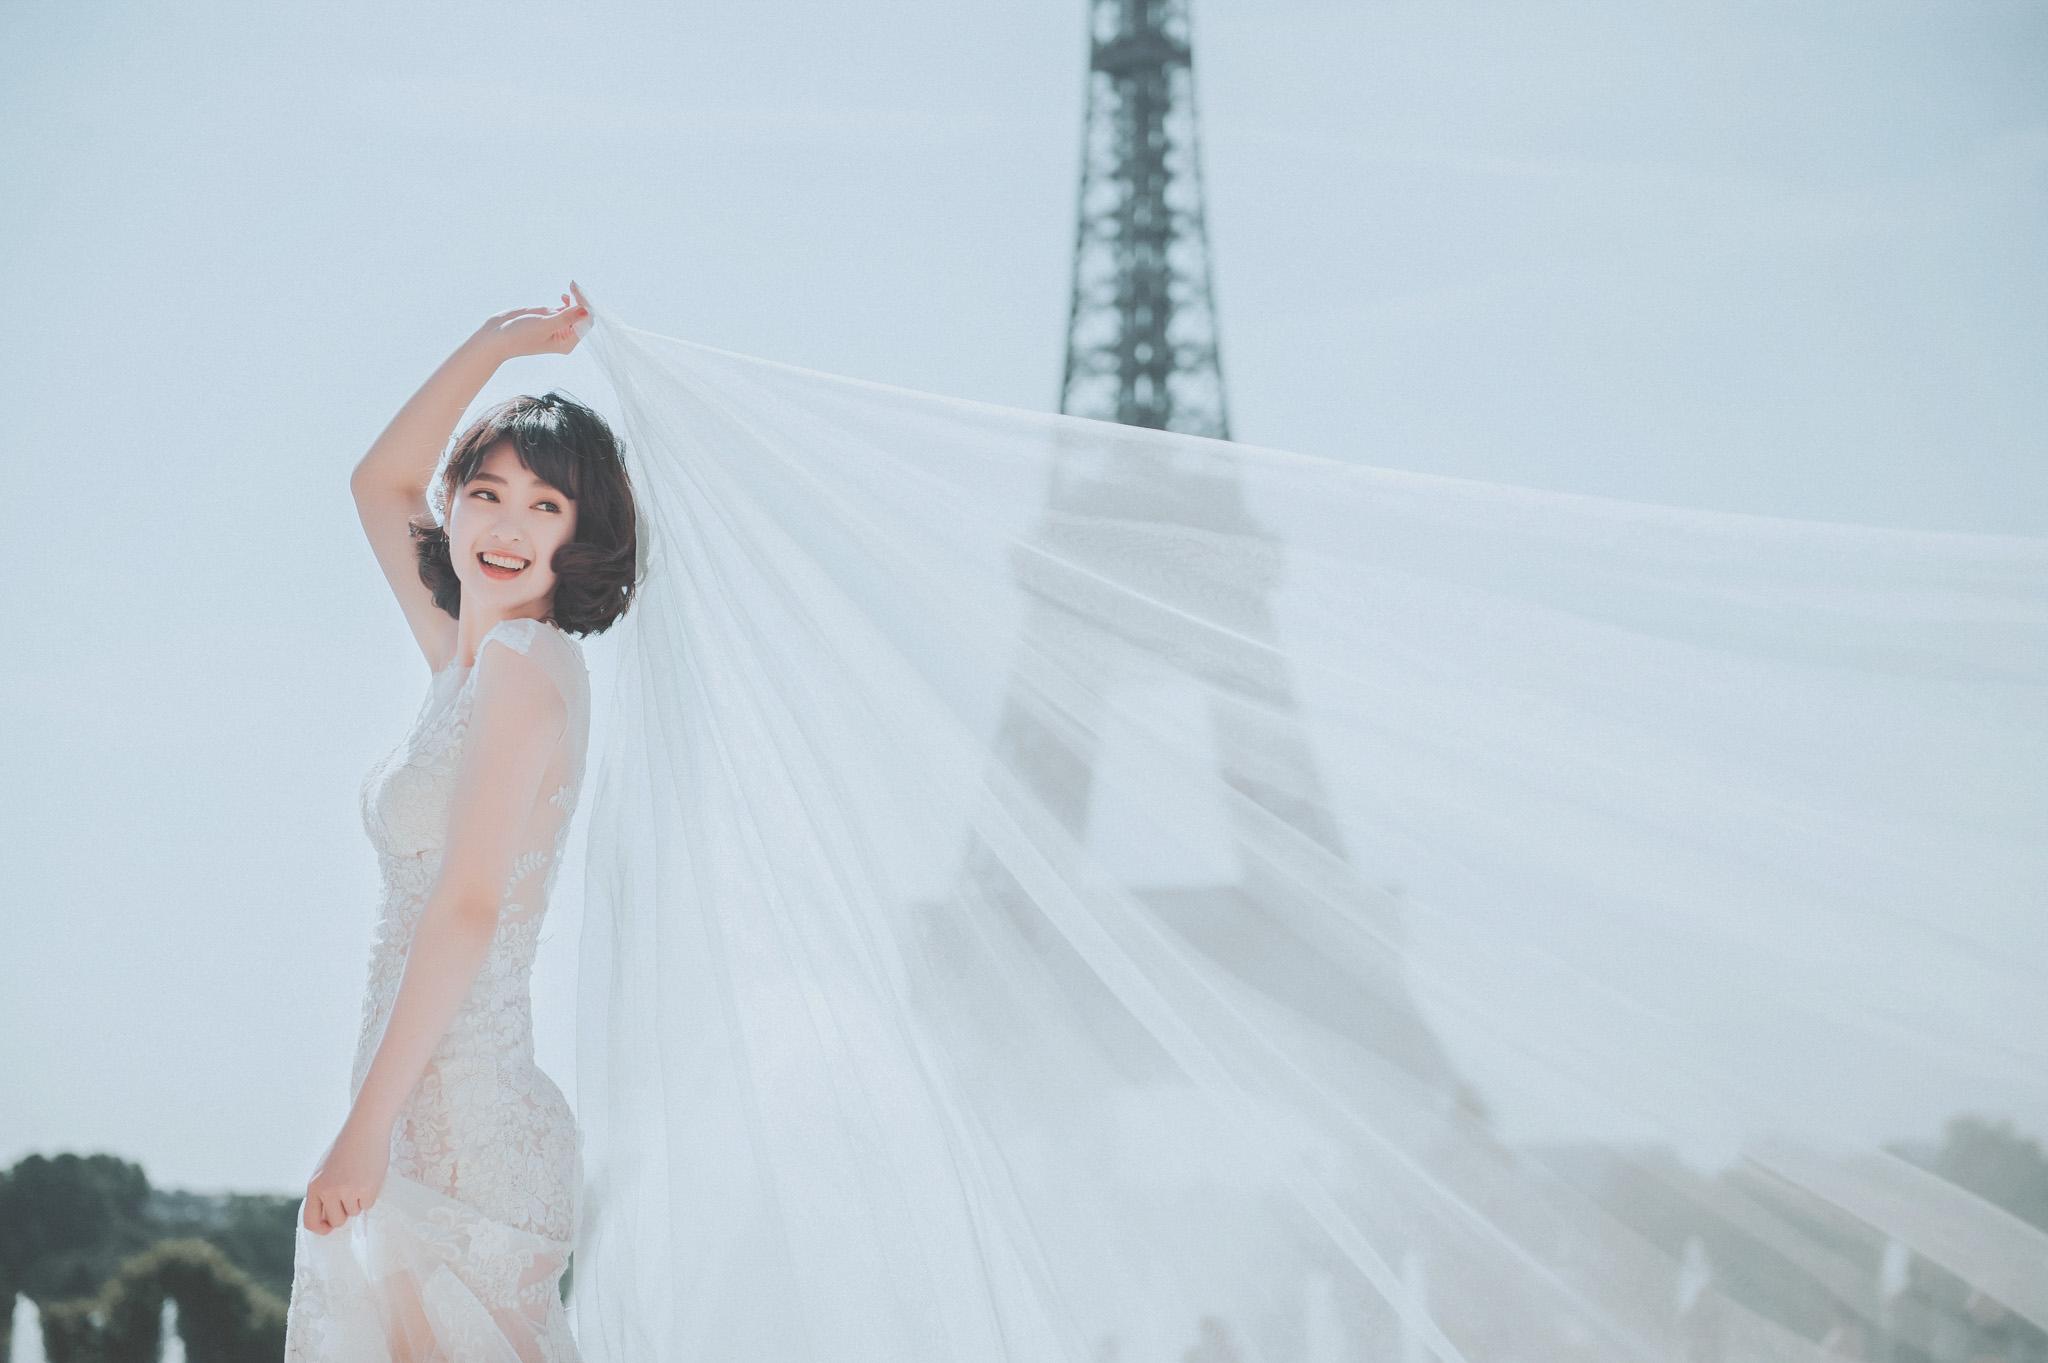 EW Easternwedding JMH 婚攝 居米 婚紗 法國 巴黎 Paris